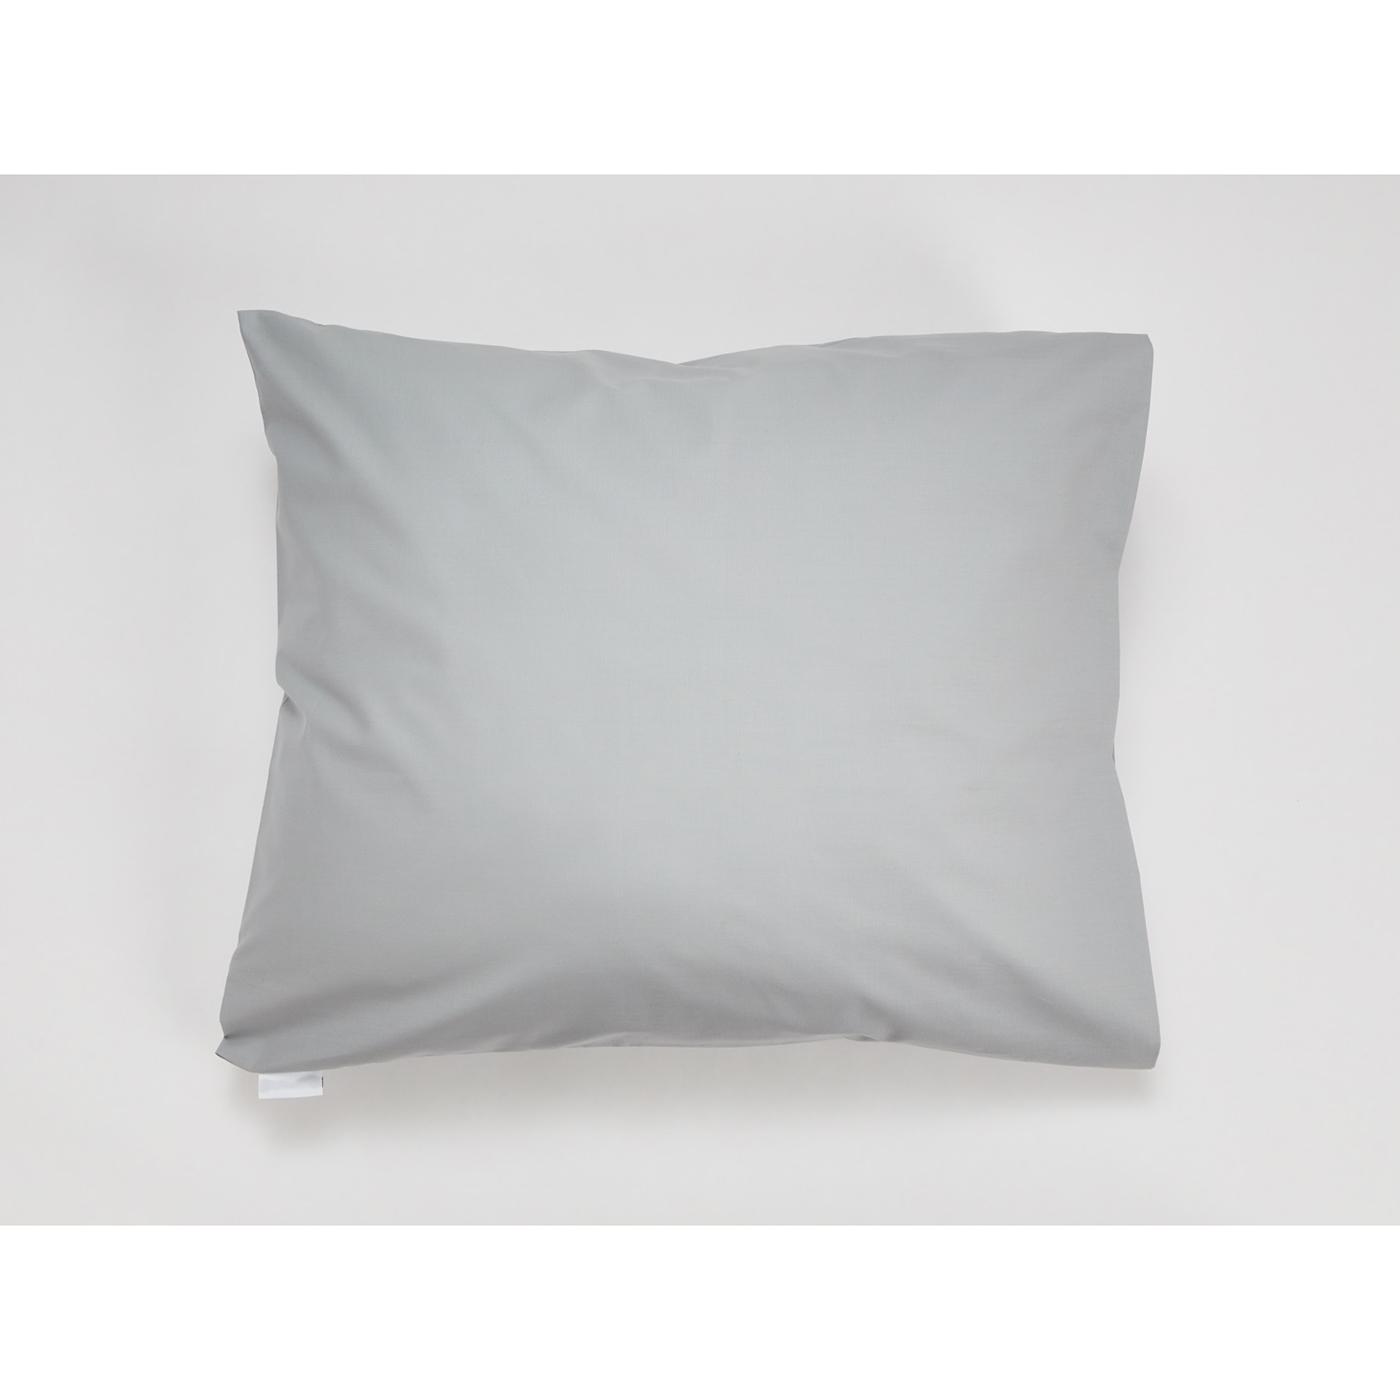 Snoooze cotton pillowcase (grey)